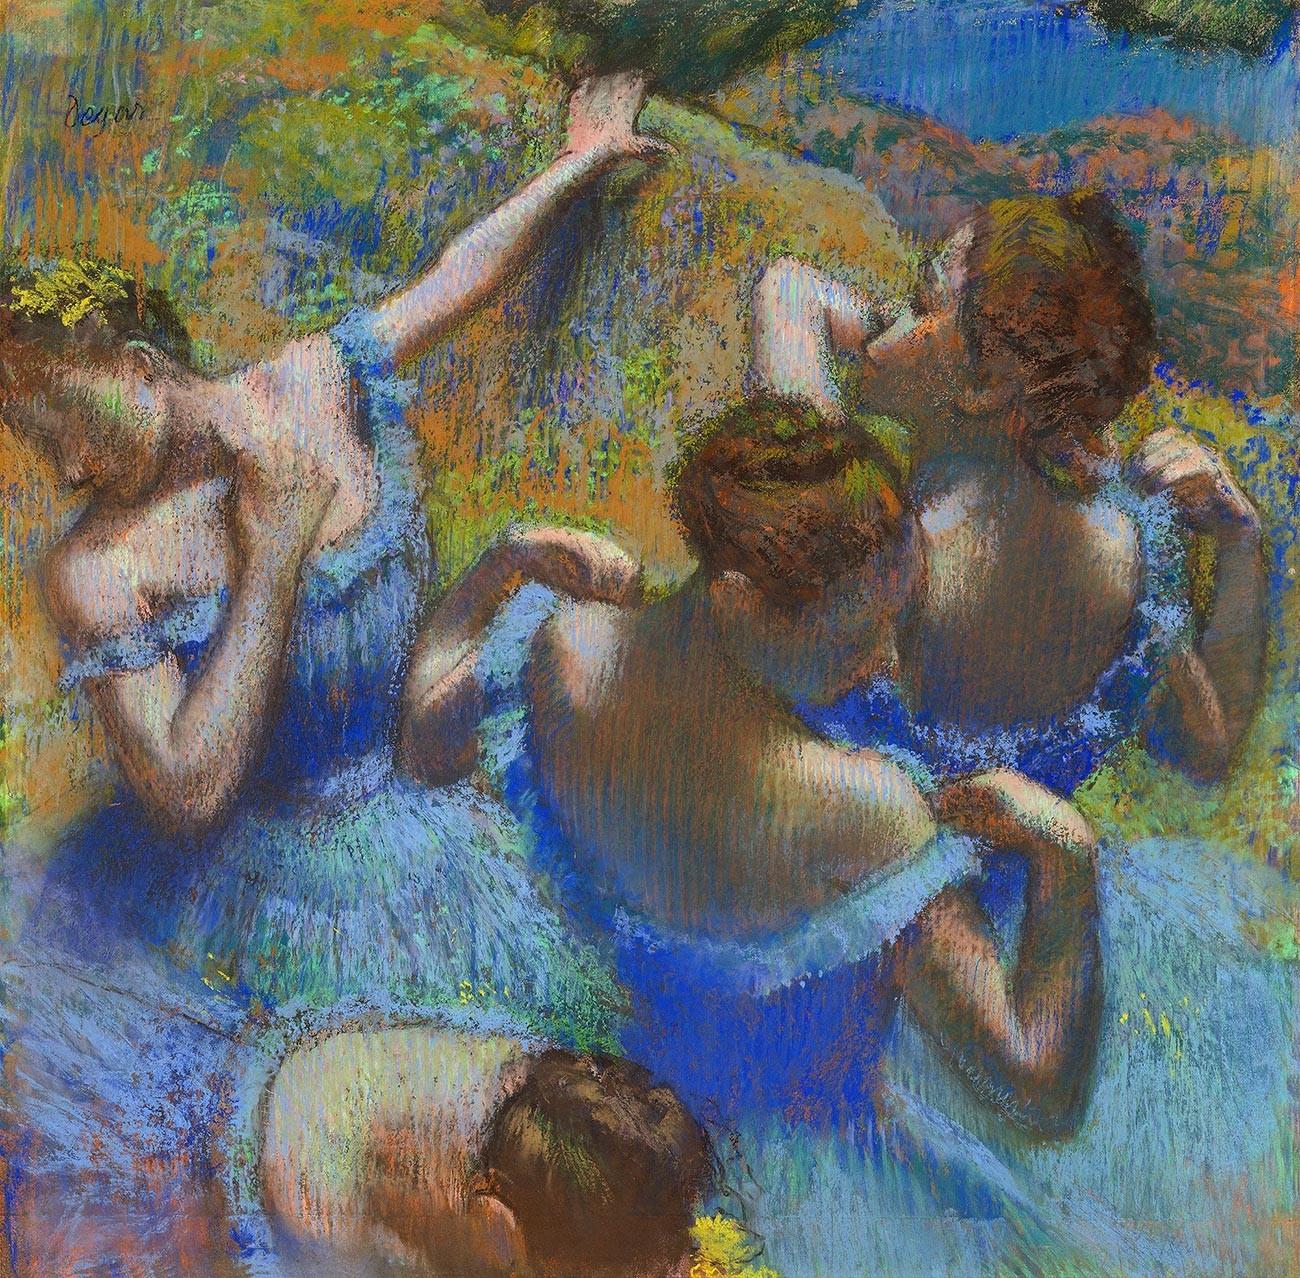 Edgar Degas. Tänzerinnen in blau, 1897.